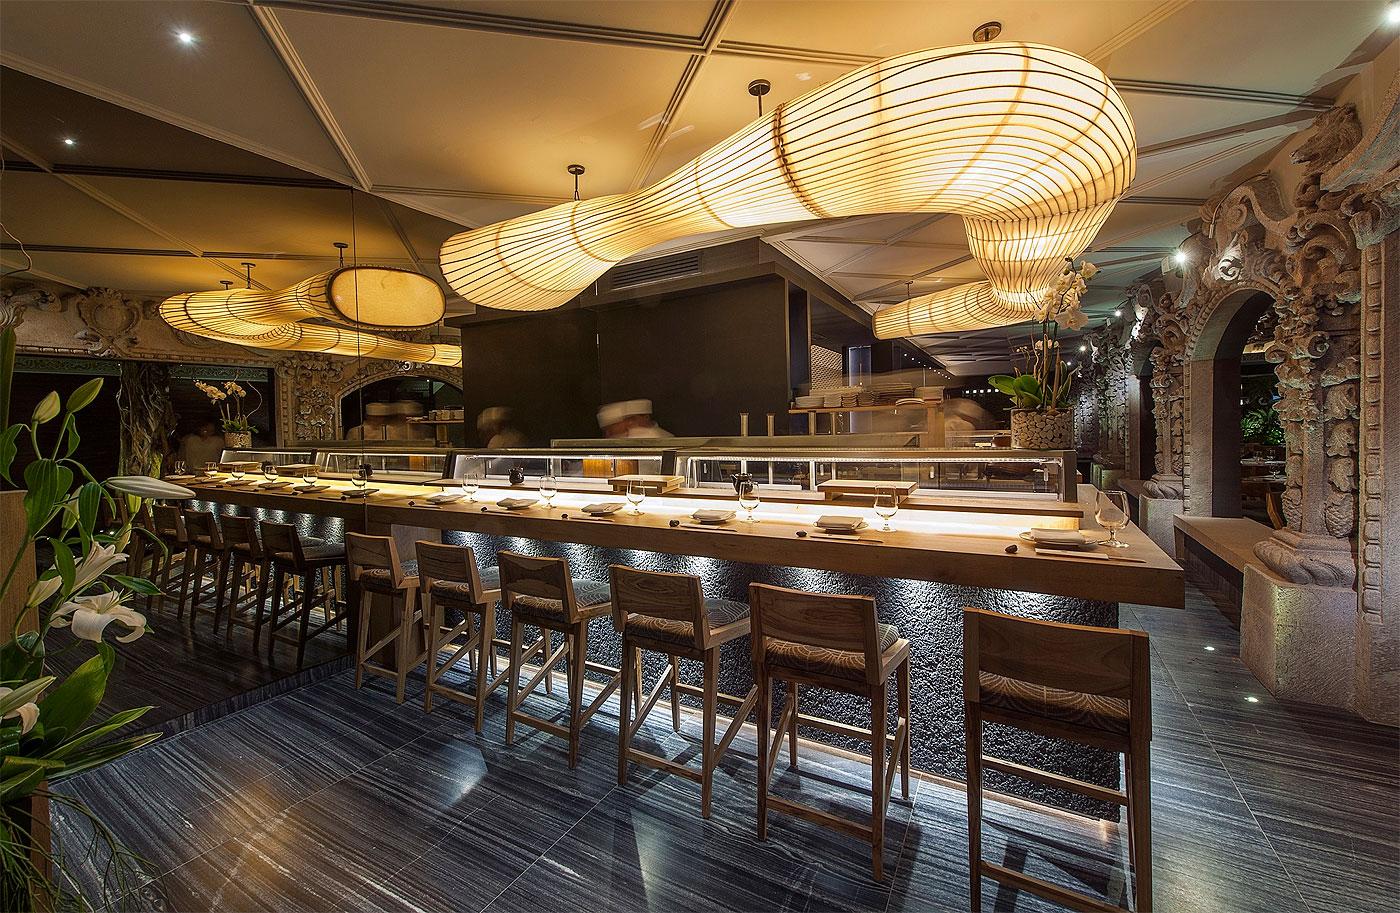 restaurante-nobu-polanco-mexico-df-bienal-latinoamerican-interiorismo